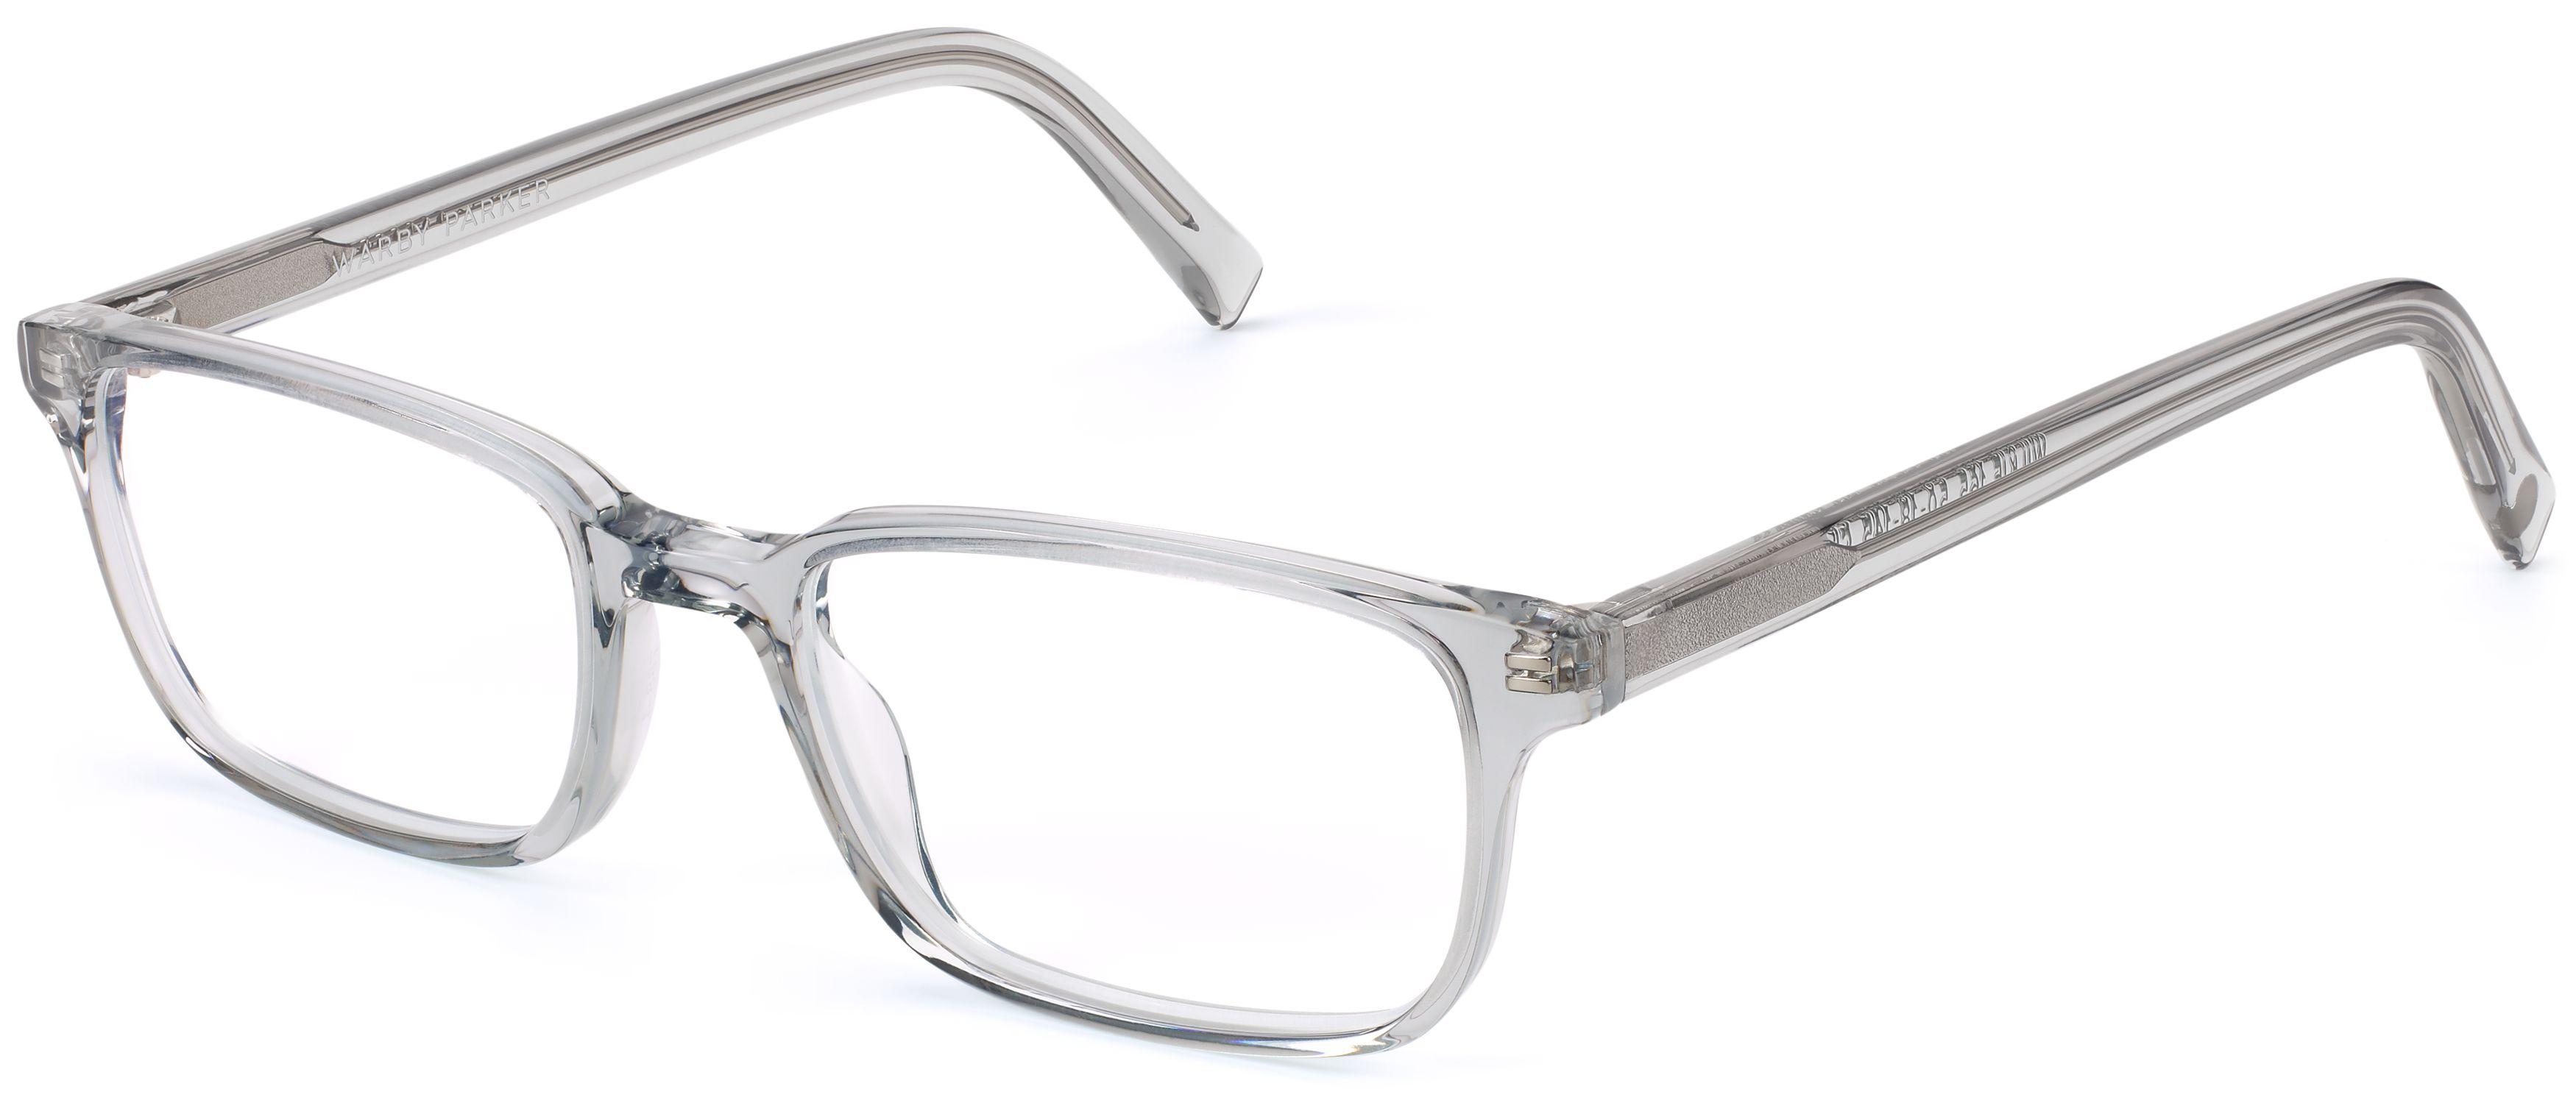 56a48f7c521 Wilkie Eyeglasses in Sea Glass Grey for Women